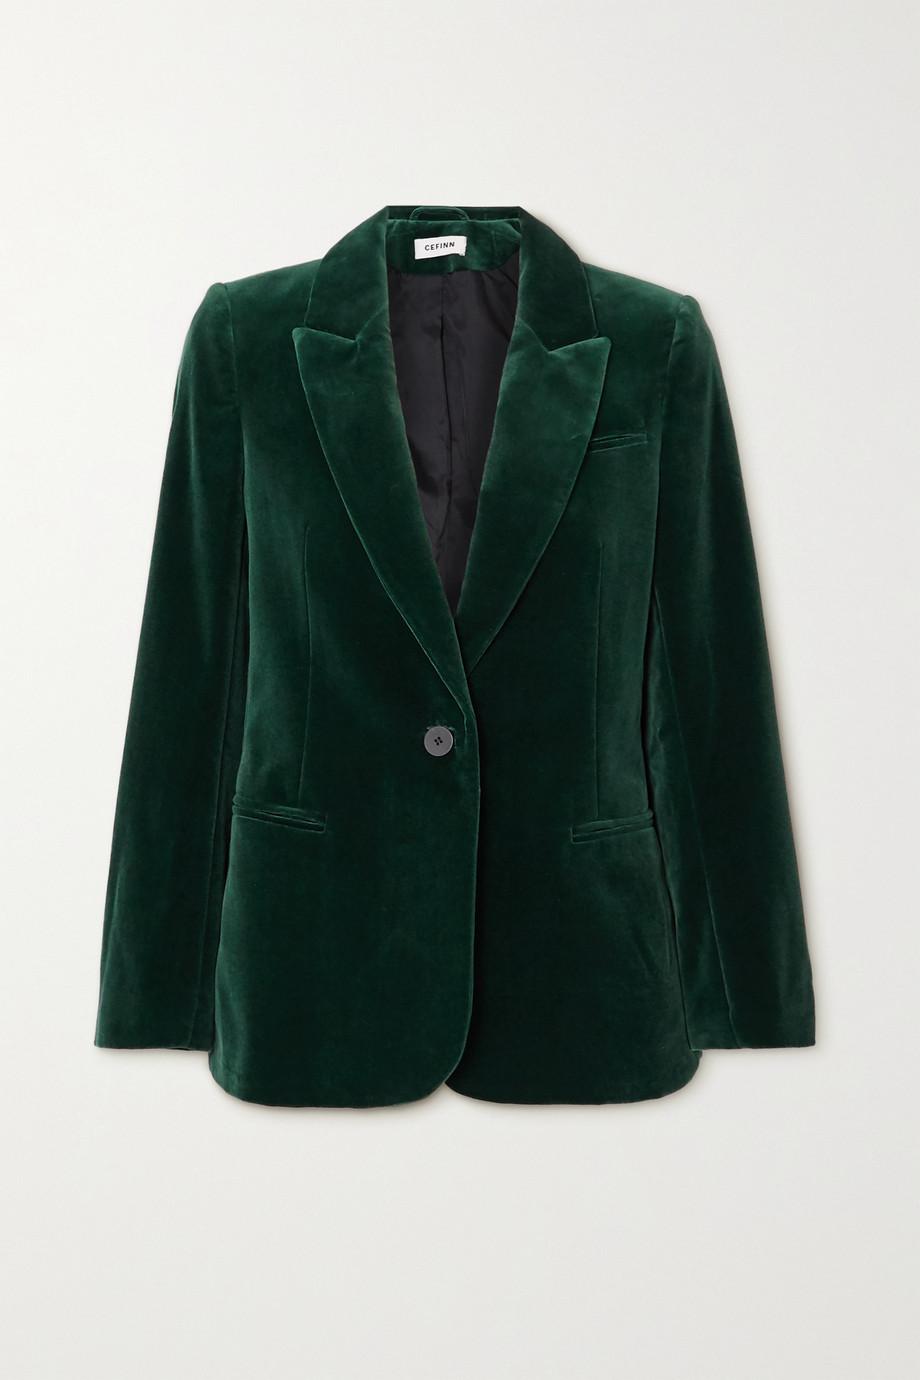 Cefinn Jamie 纯棉天鹅绒西装外套